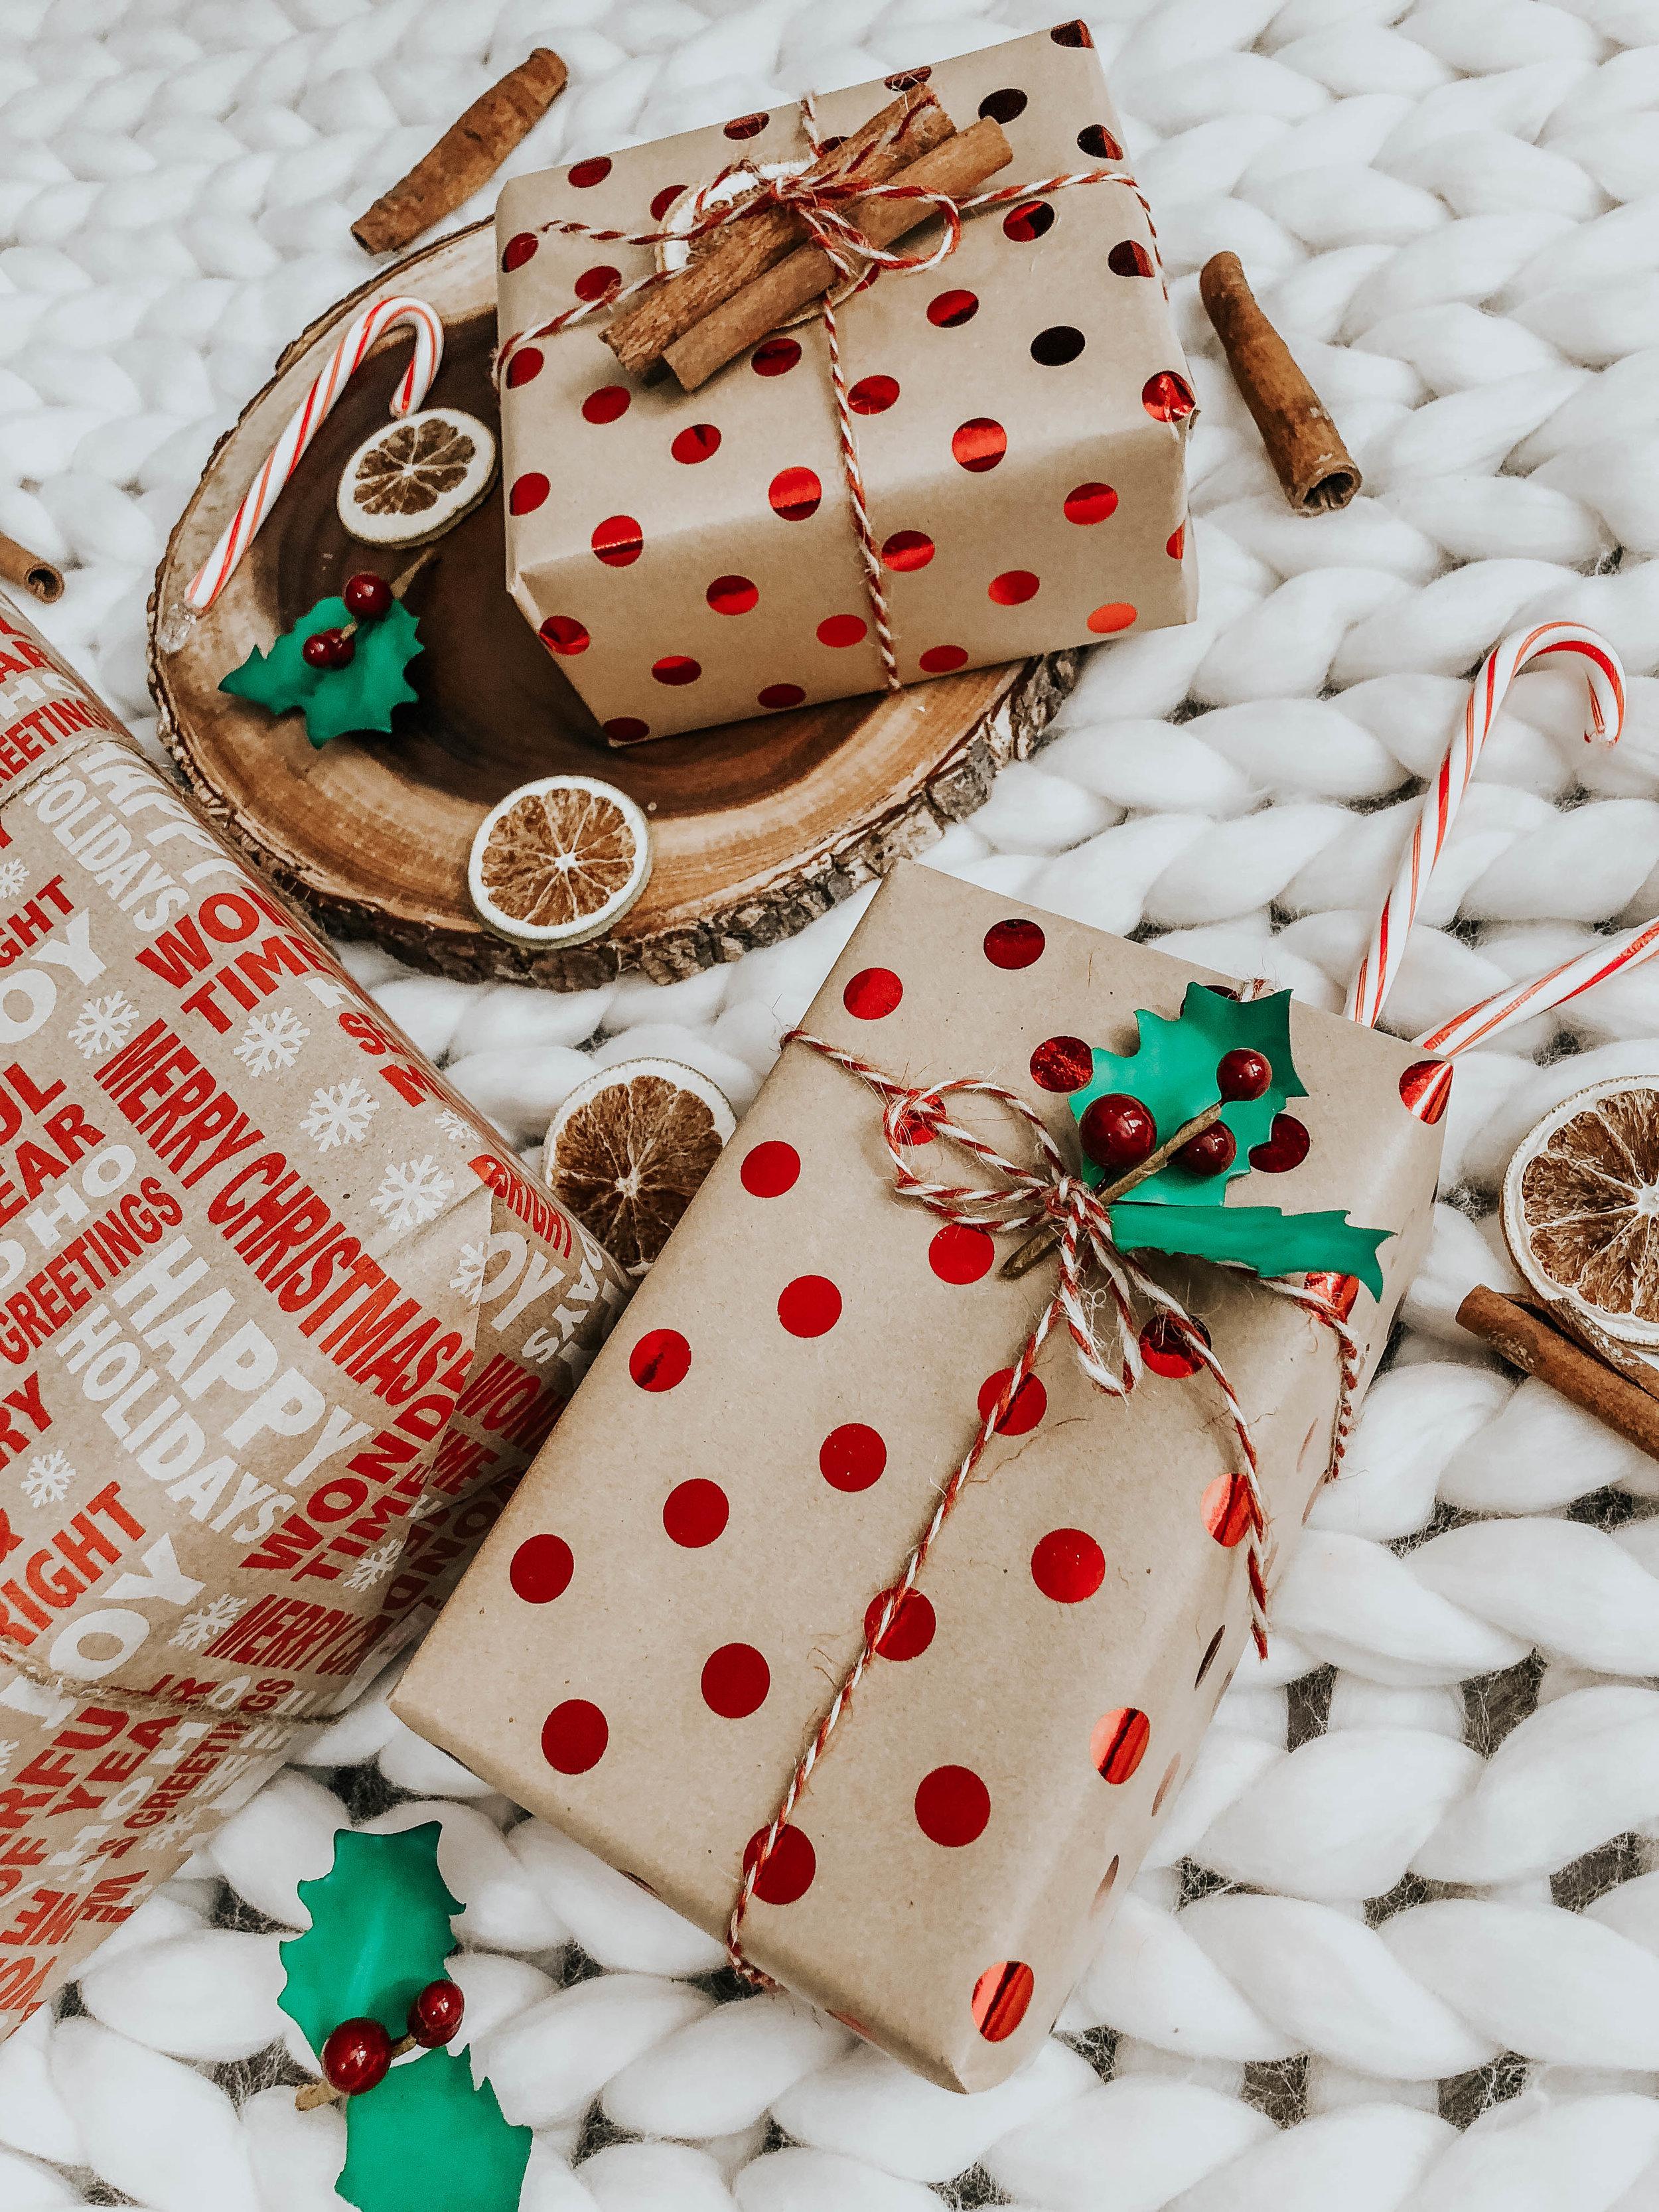 Christmas wrapper GIFT Ideas  (1).JPG